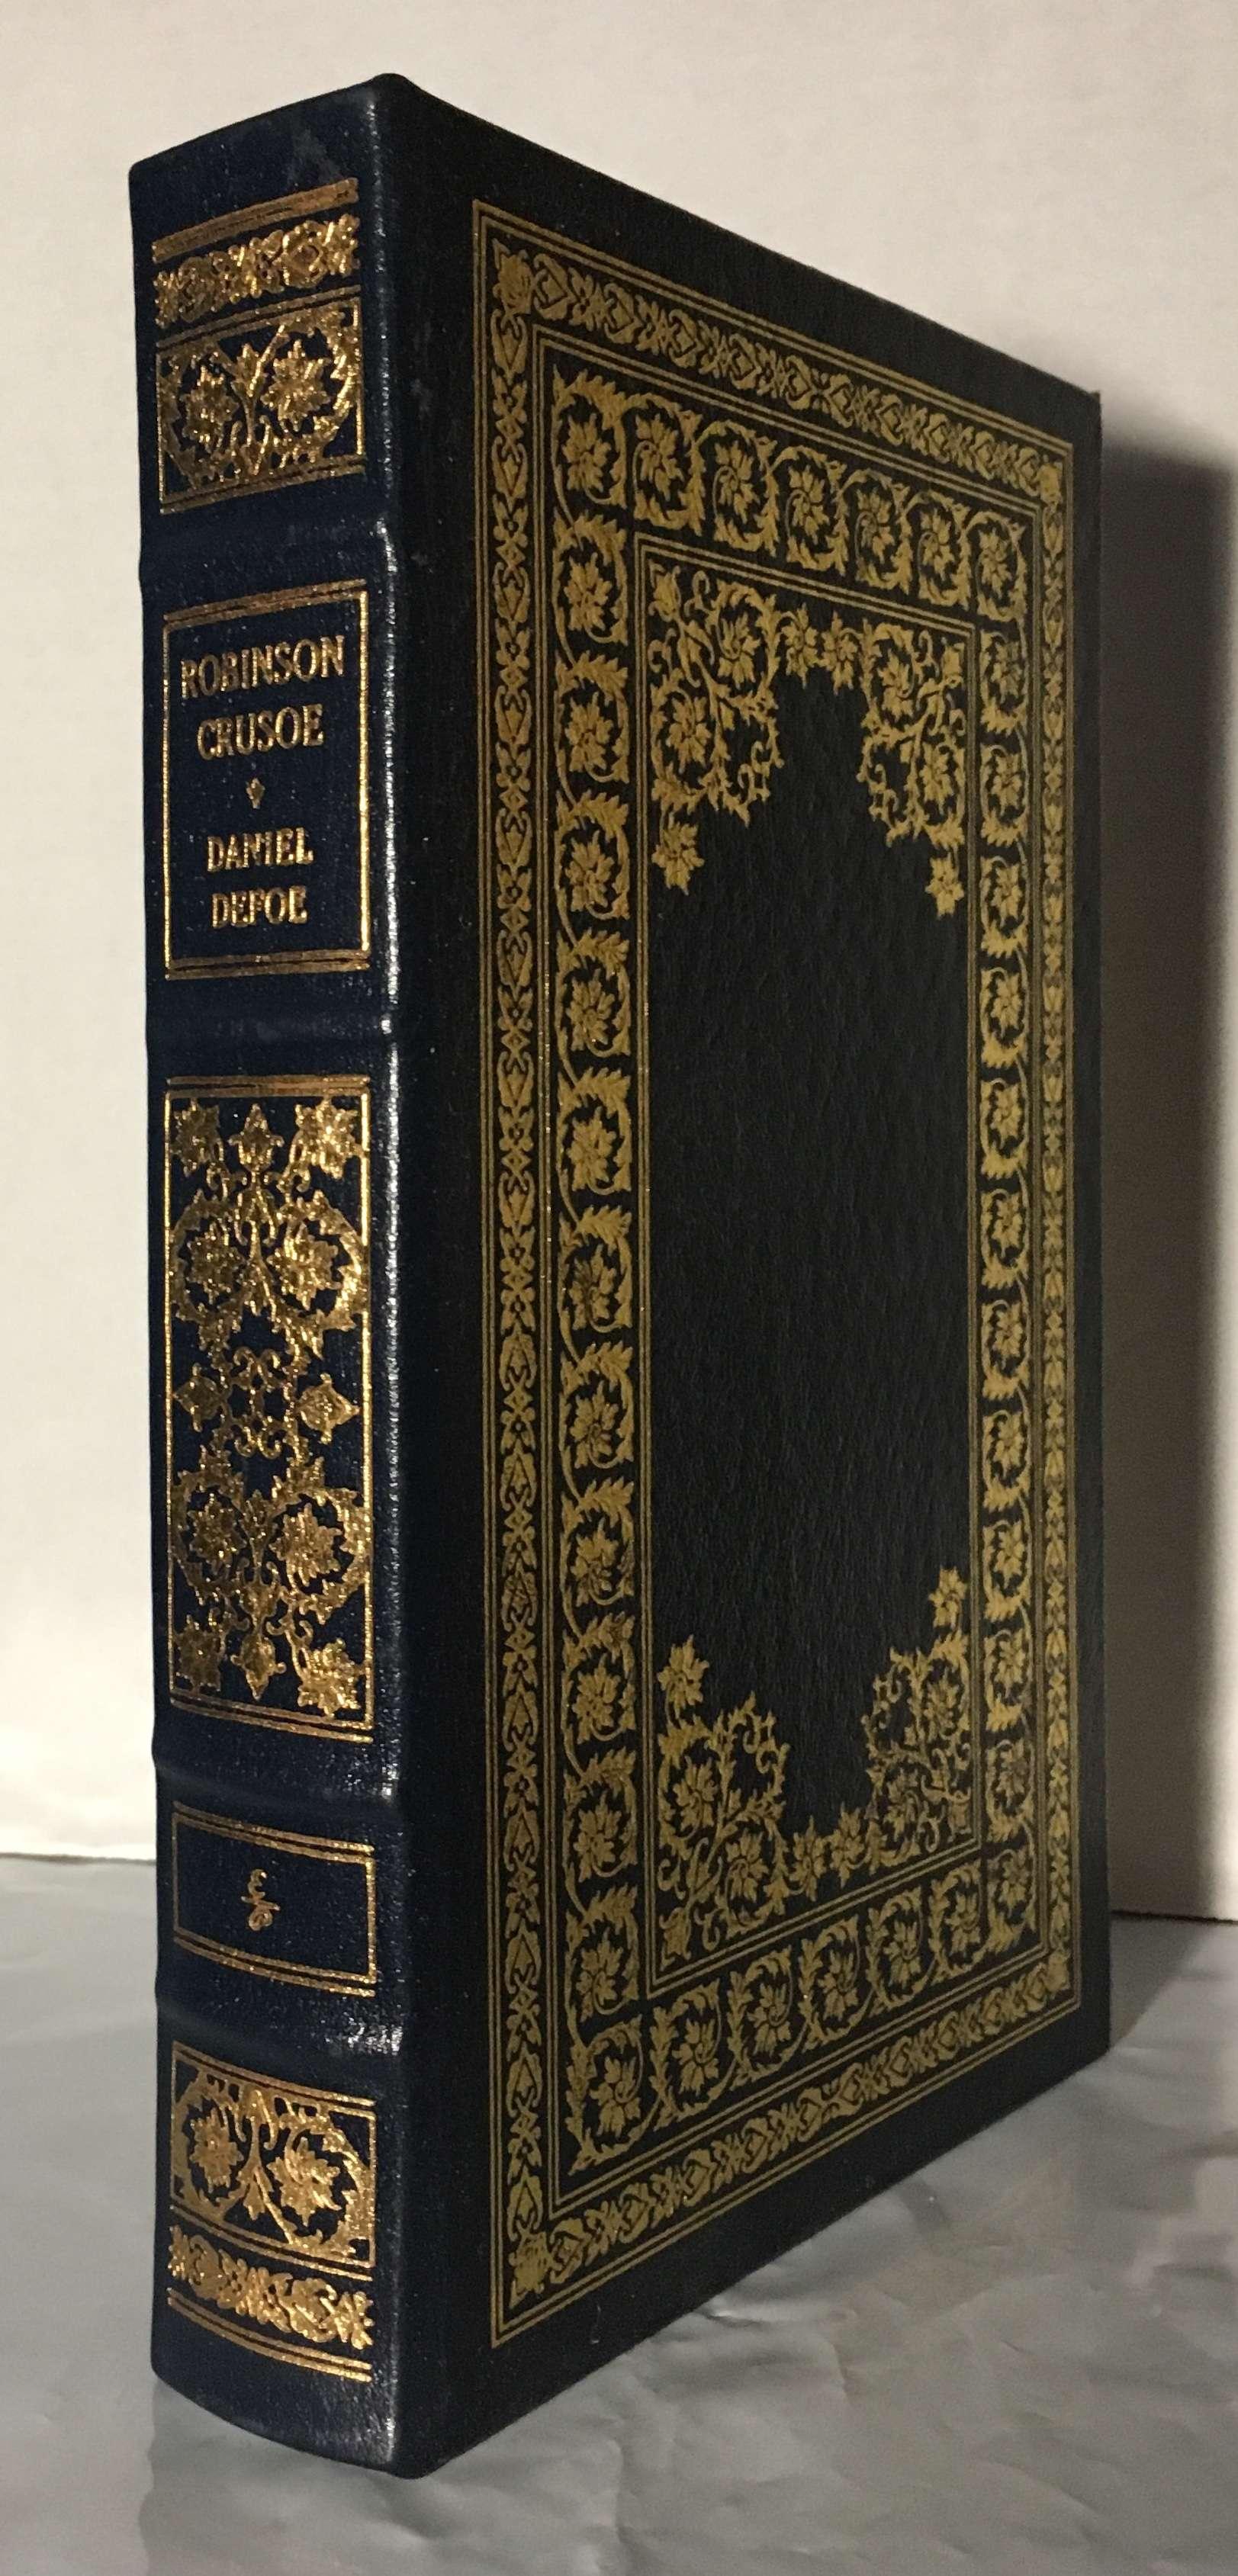 The Life & Strange Adventures of Robinson Crusoe, Daniel Defoe